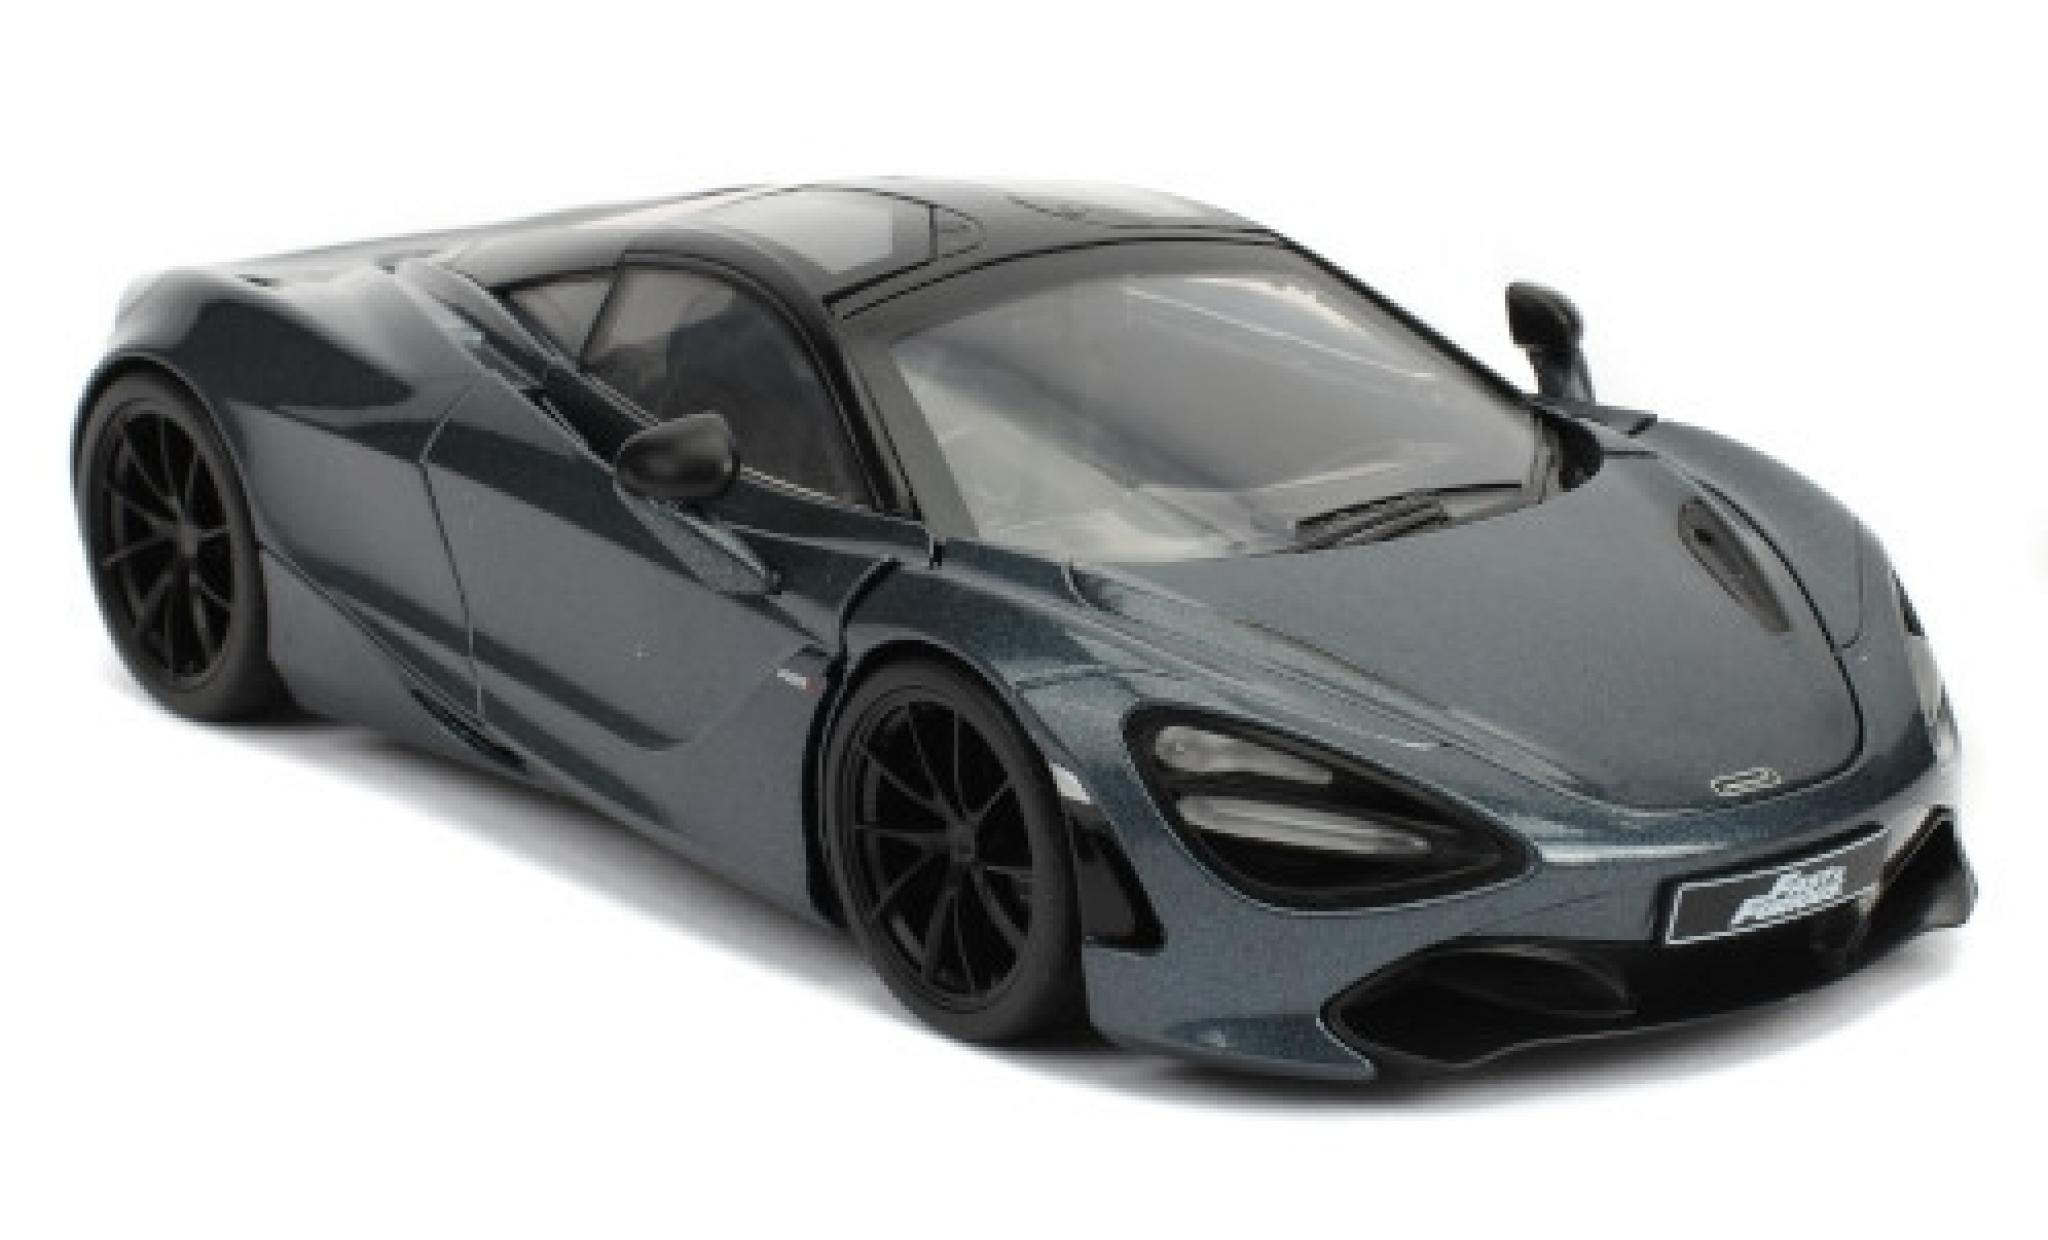 McLaren 720 1/24 Jada S metallise grise/noire RHD Fast & Furious